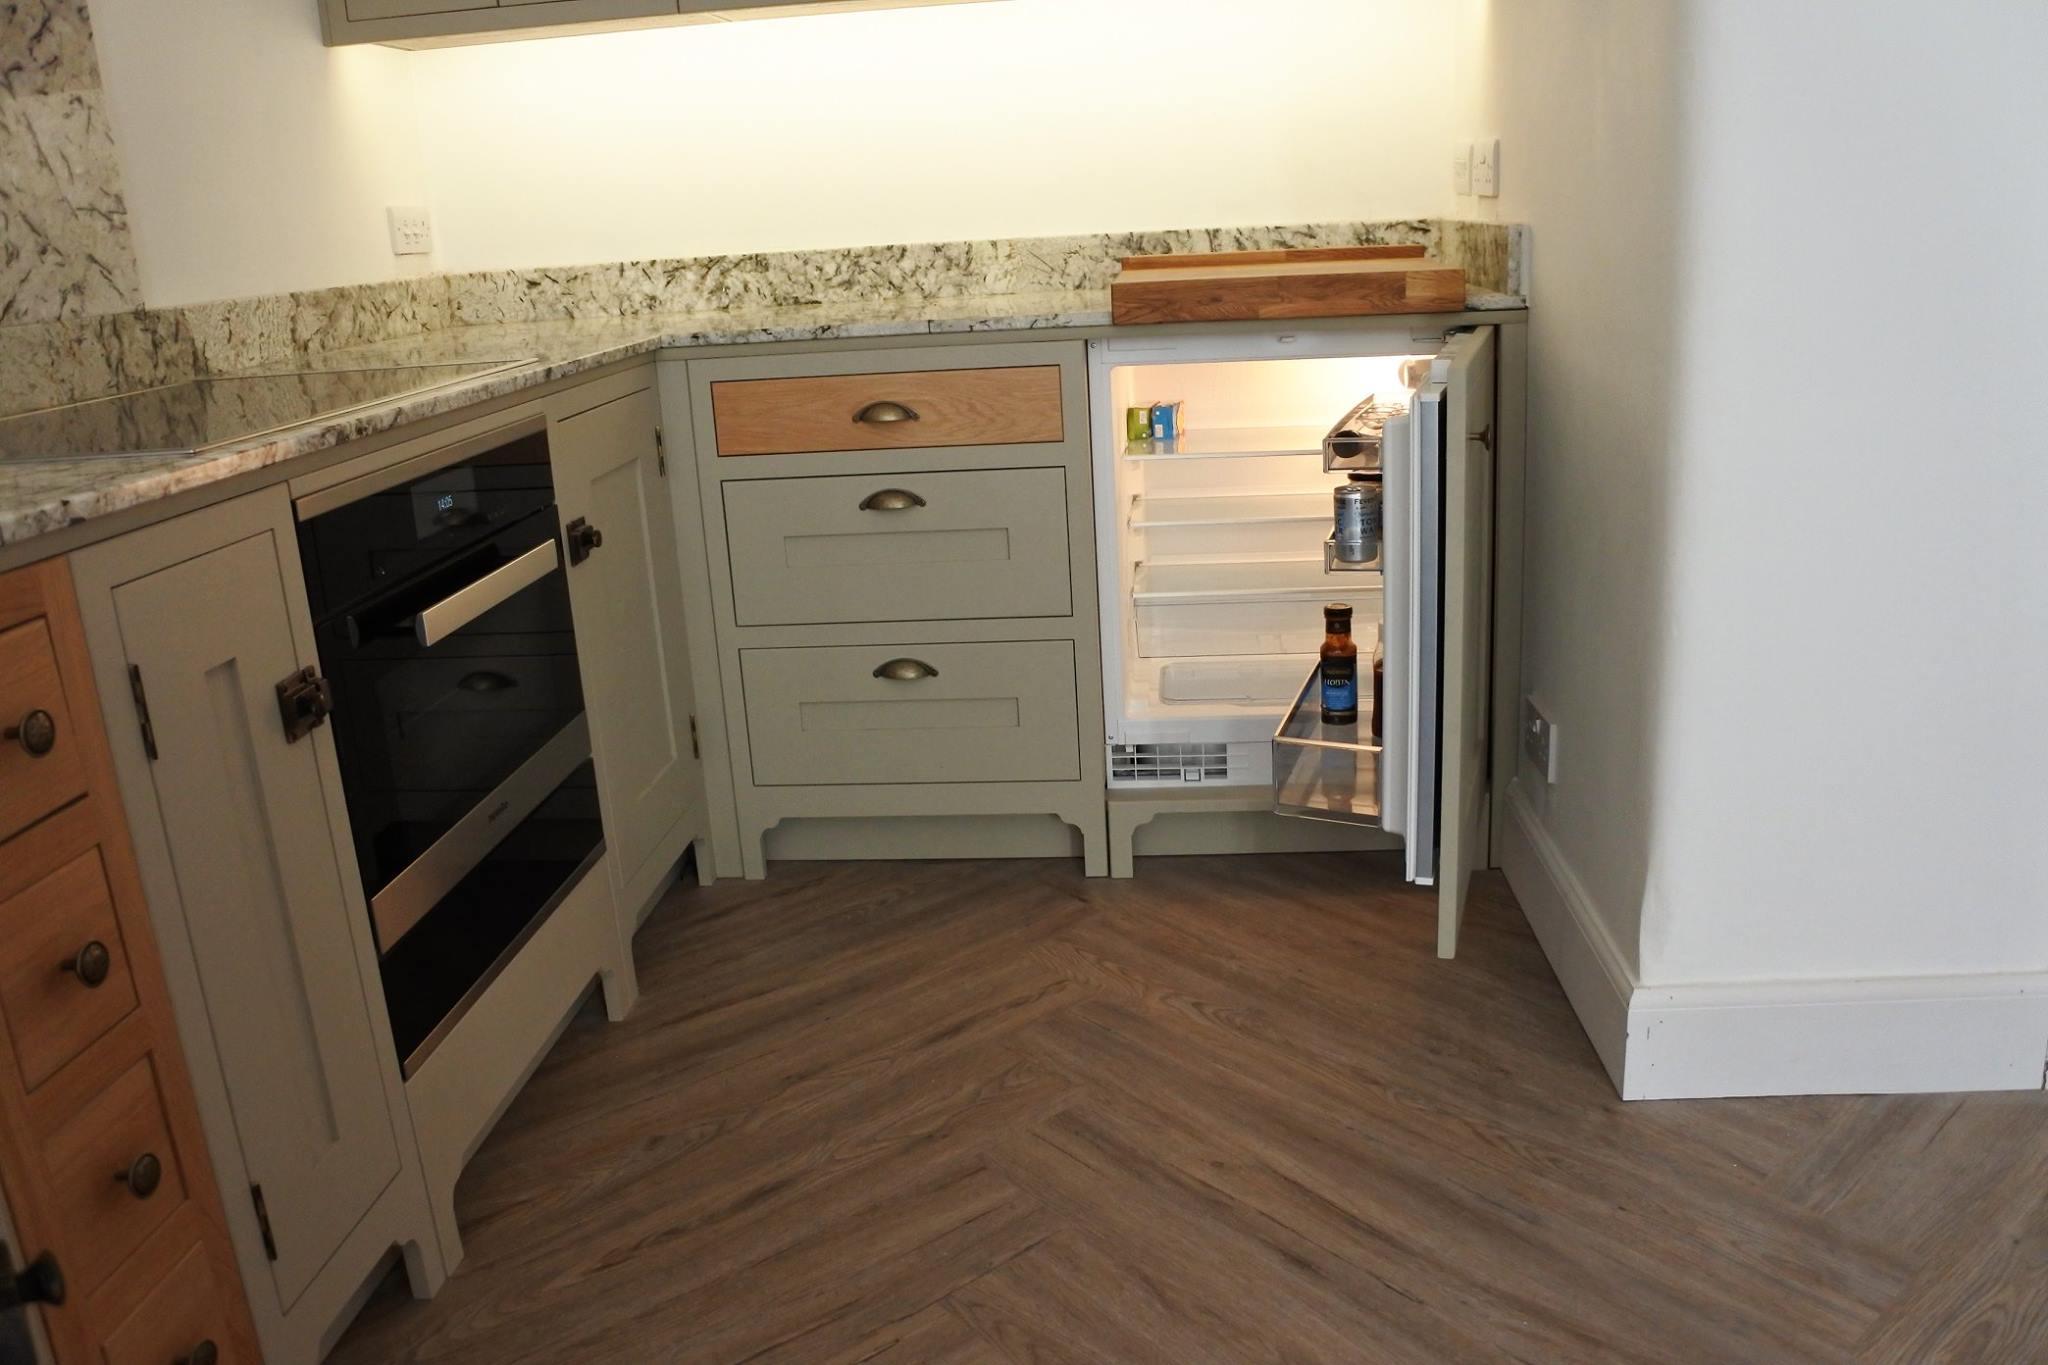 glasgow-bespoke-kitchens-fridge